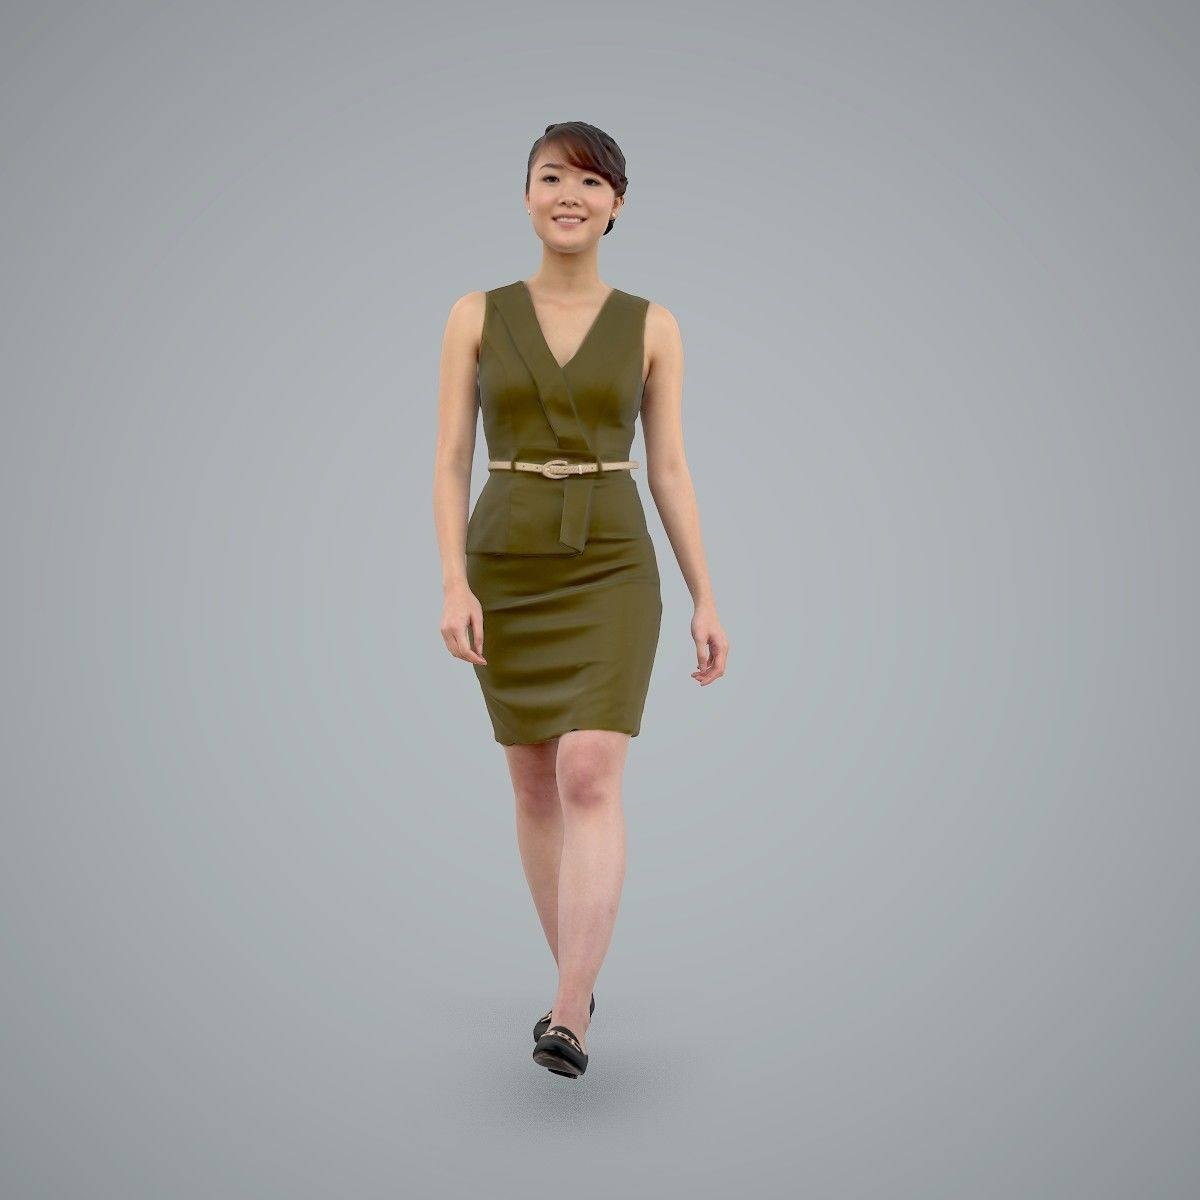 Walking Business Woman with Dress BWom0100-HD2-O02P02-S